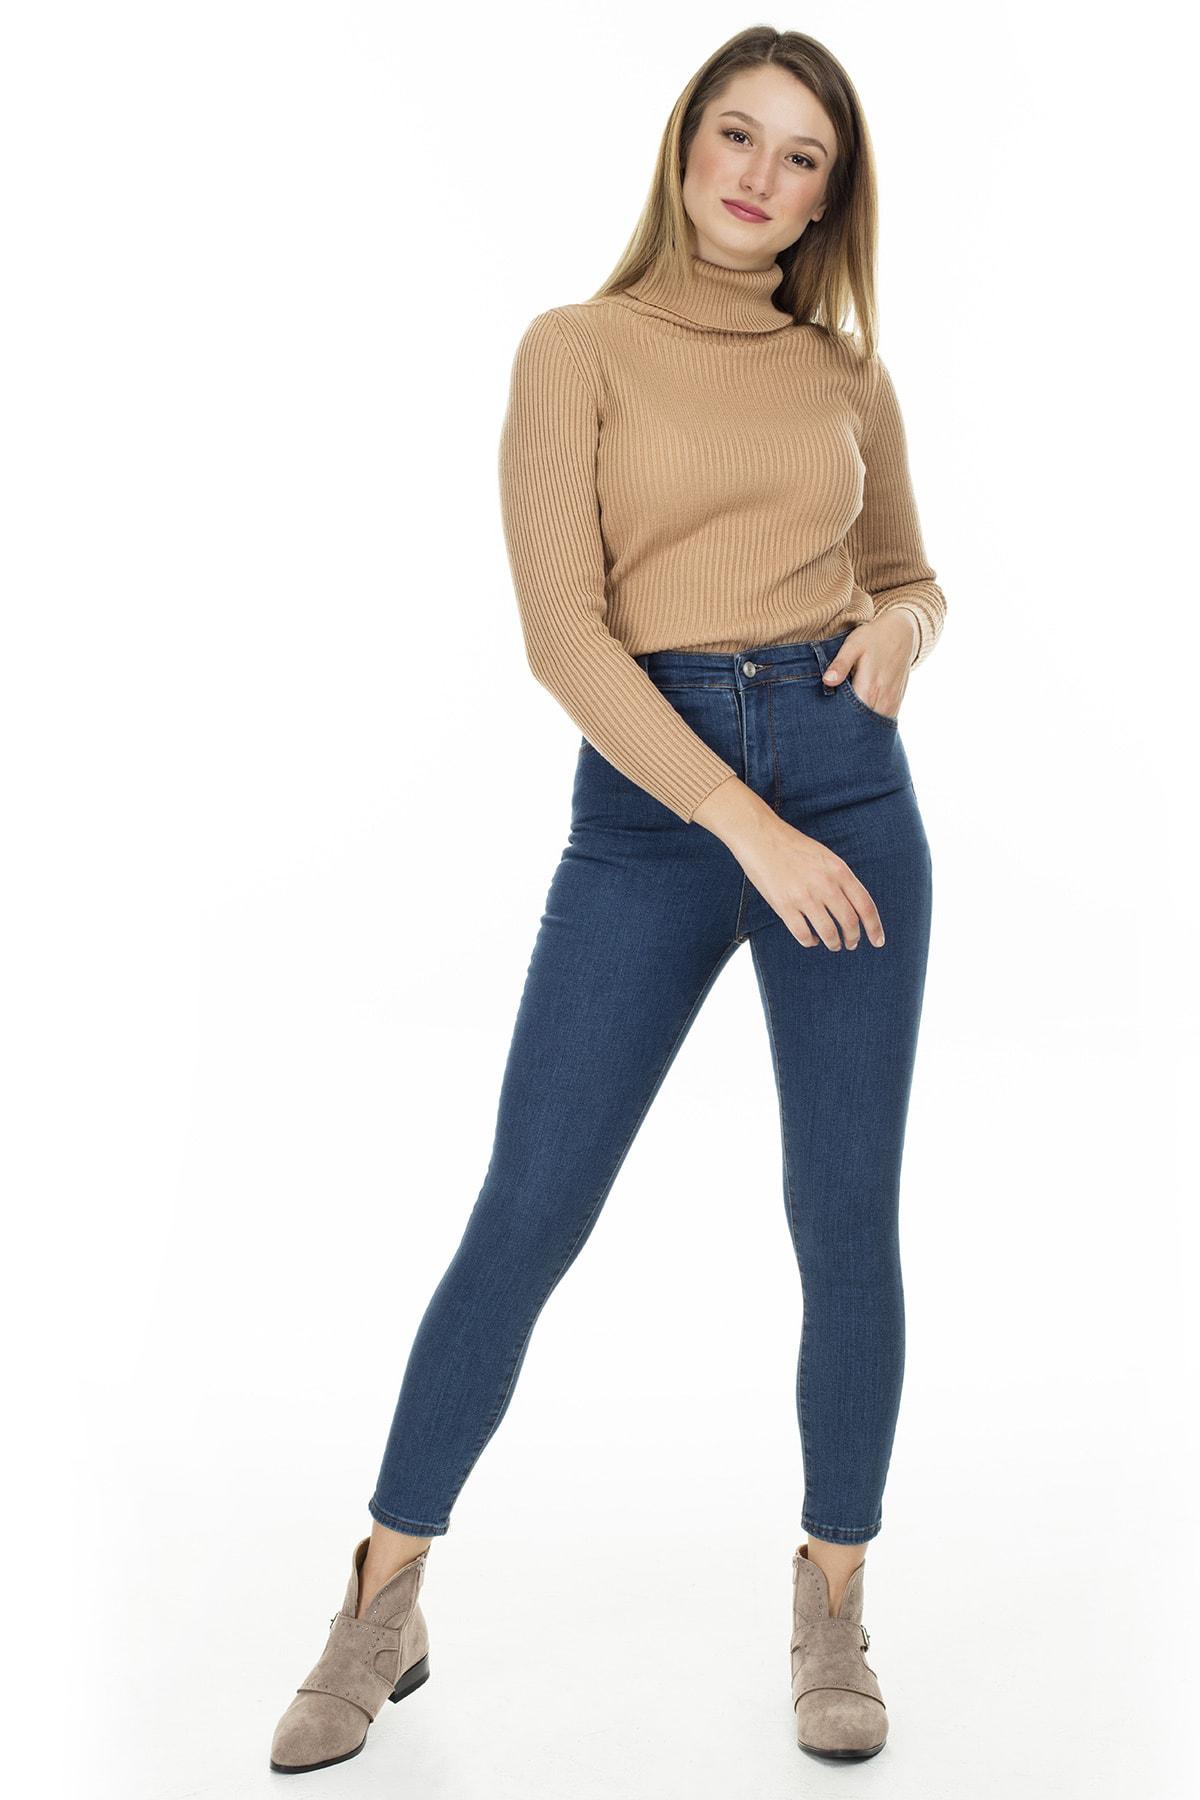 Lela Yüksek Bel Skinny Jeans KADIN KOT PANTOLON 58714859